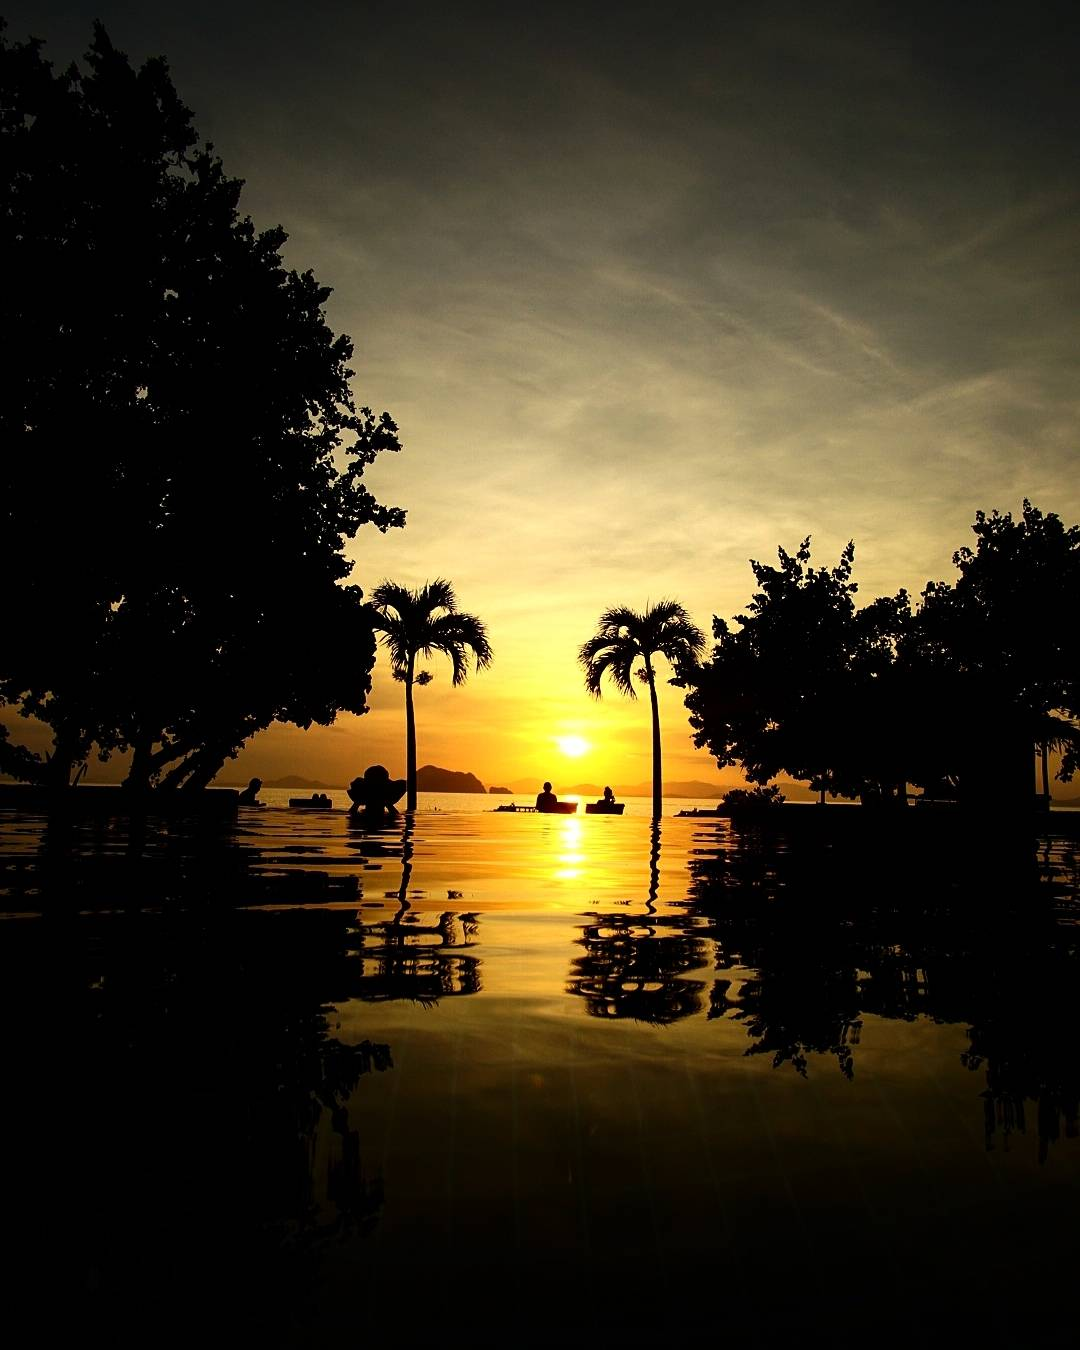 sunset with golden glow on Koh Yao Yai